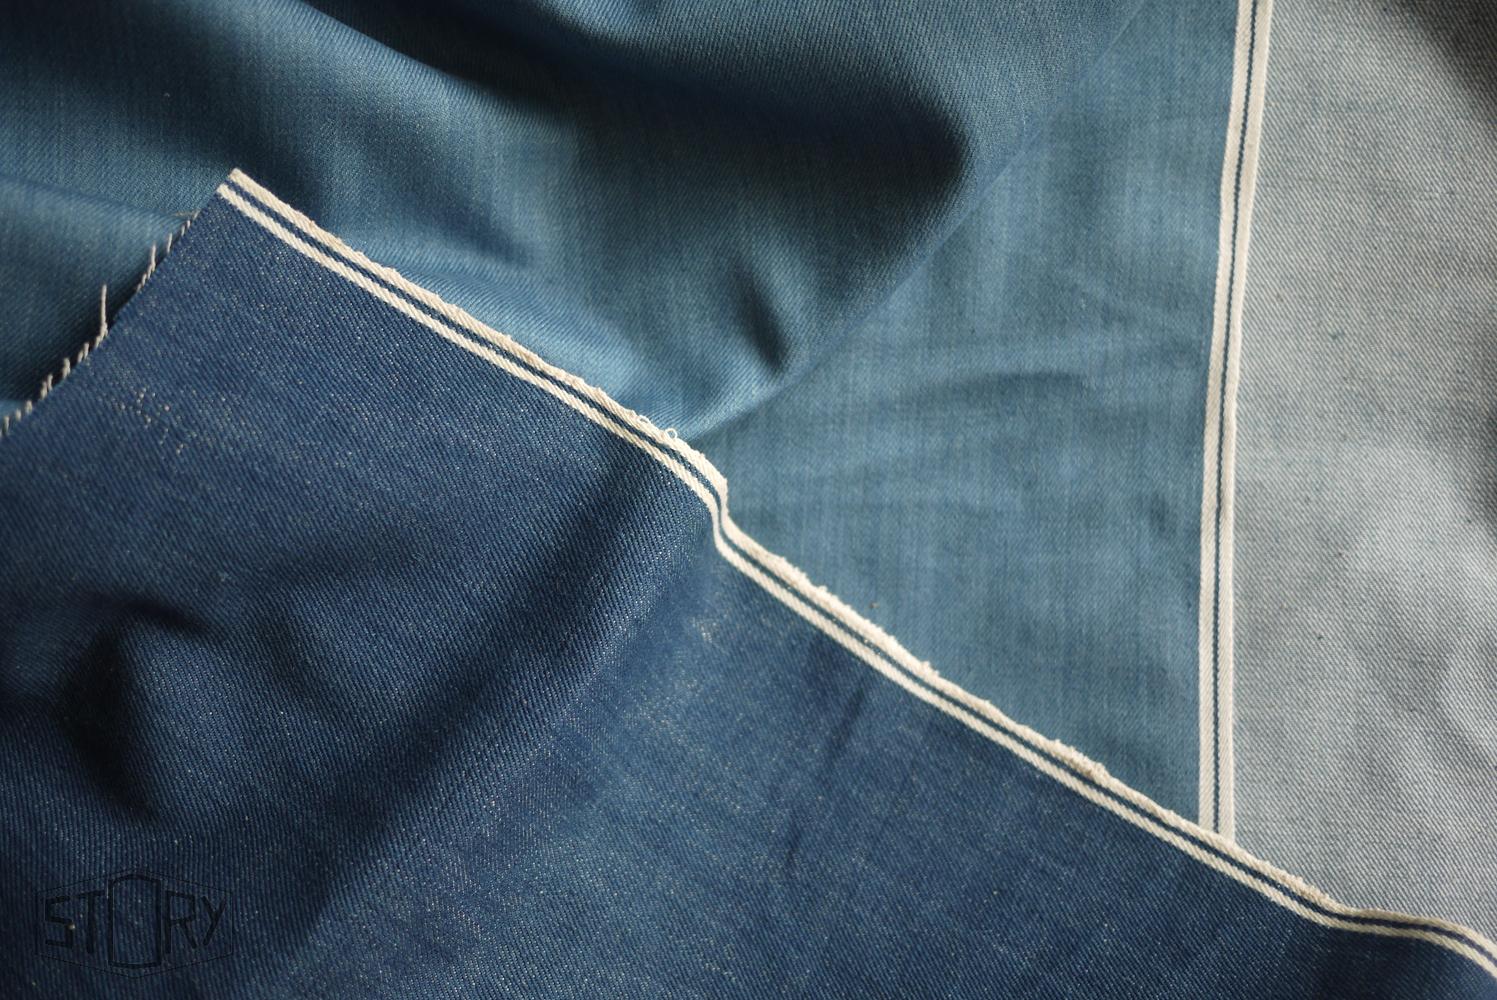 STORYmfg_Hank_fabrics_05